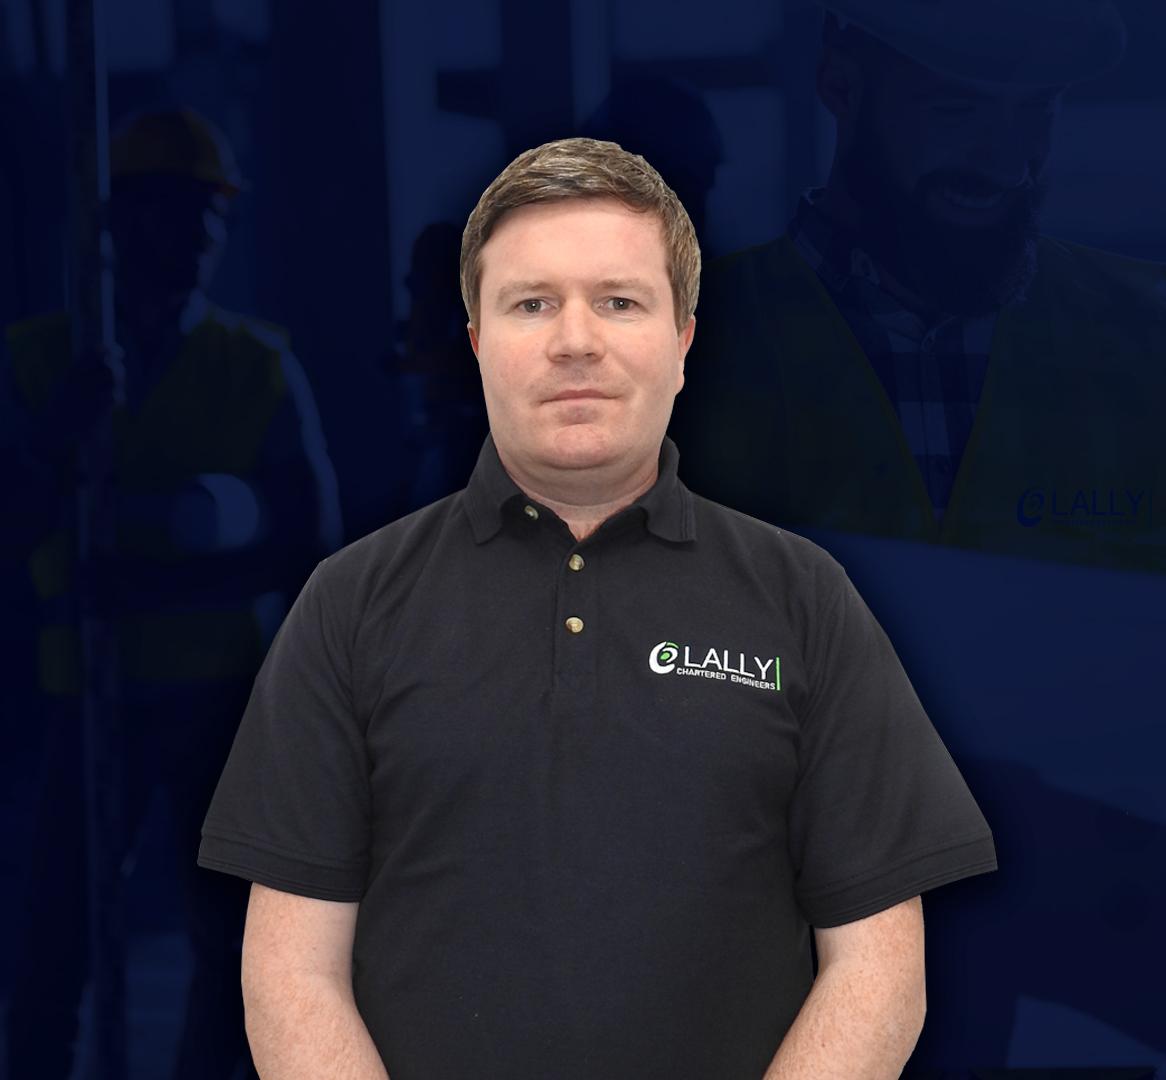 Shane Heffernan Lead Structural Design Engineer, Lally Chartered Engineering, Mayo, Ireland